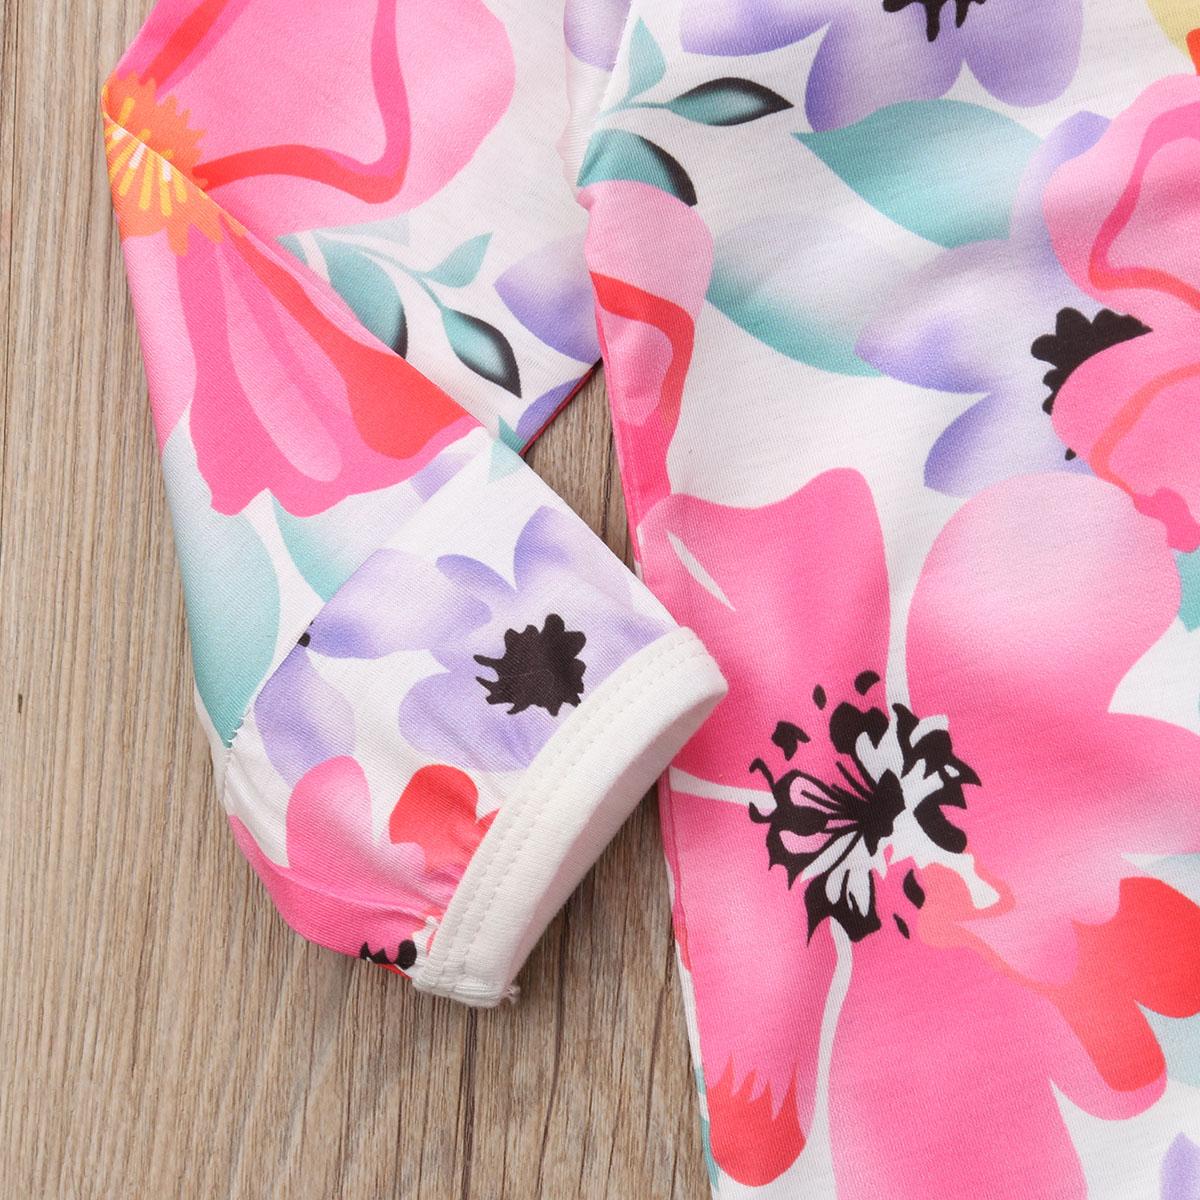 HTB1rE1raLjsK1Rjy1Xaq6zispXaP Pudcoco Girl Jumpsuits 0-24M US Flower Newborn Baby Girl Zipper Cotton Romper Jumpsuit Autumn Outfits Clothes